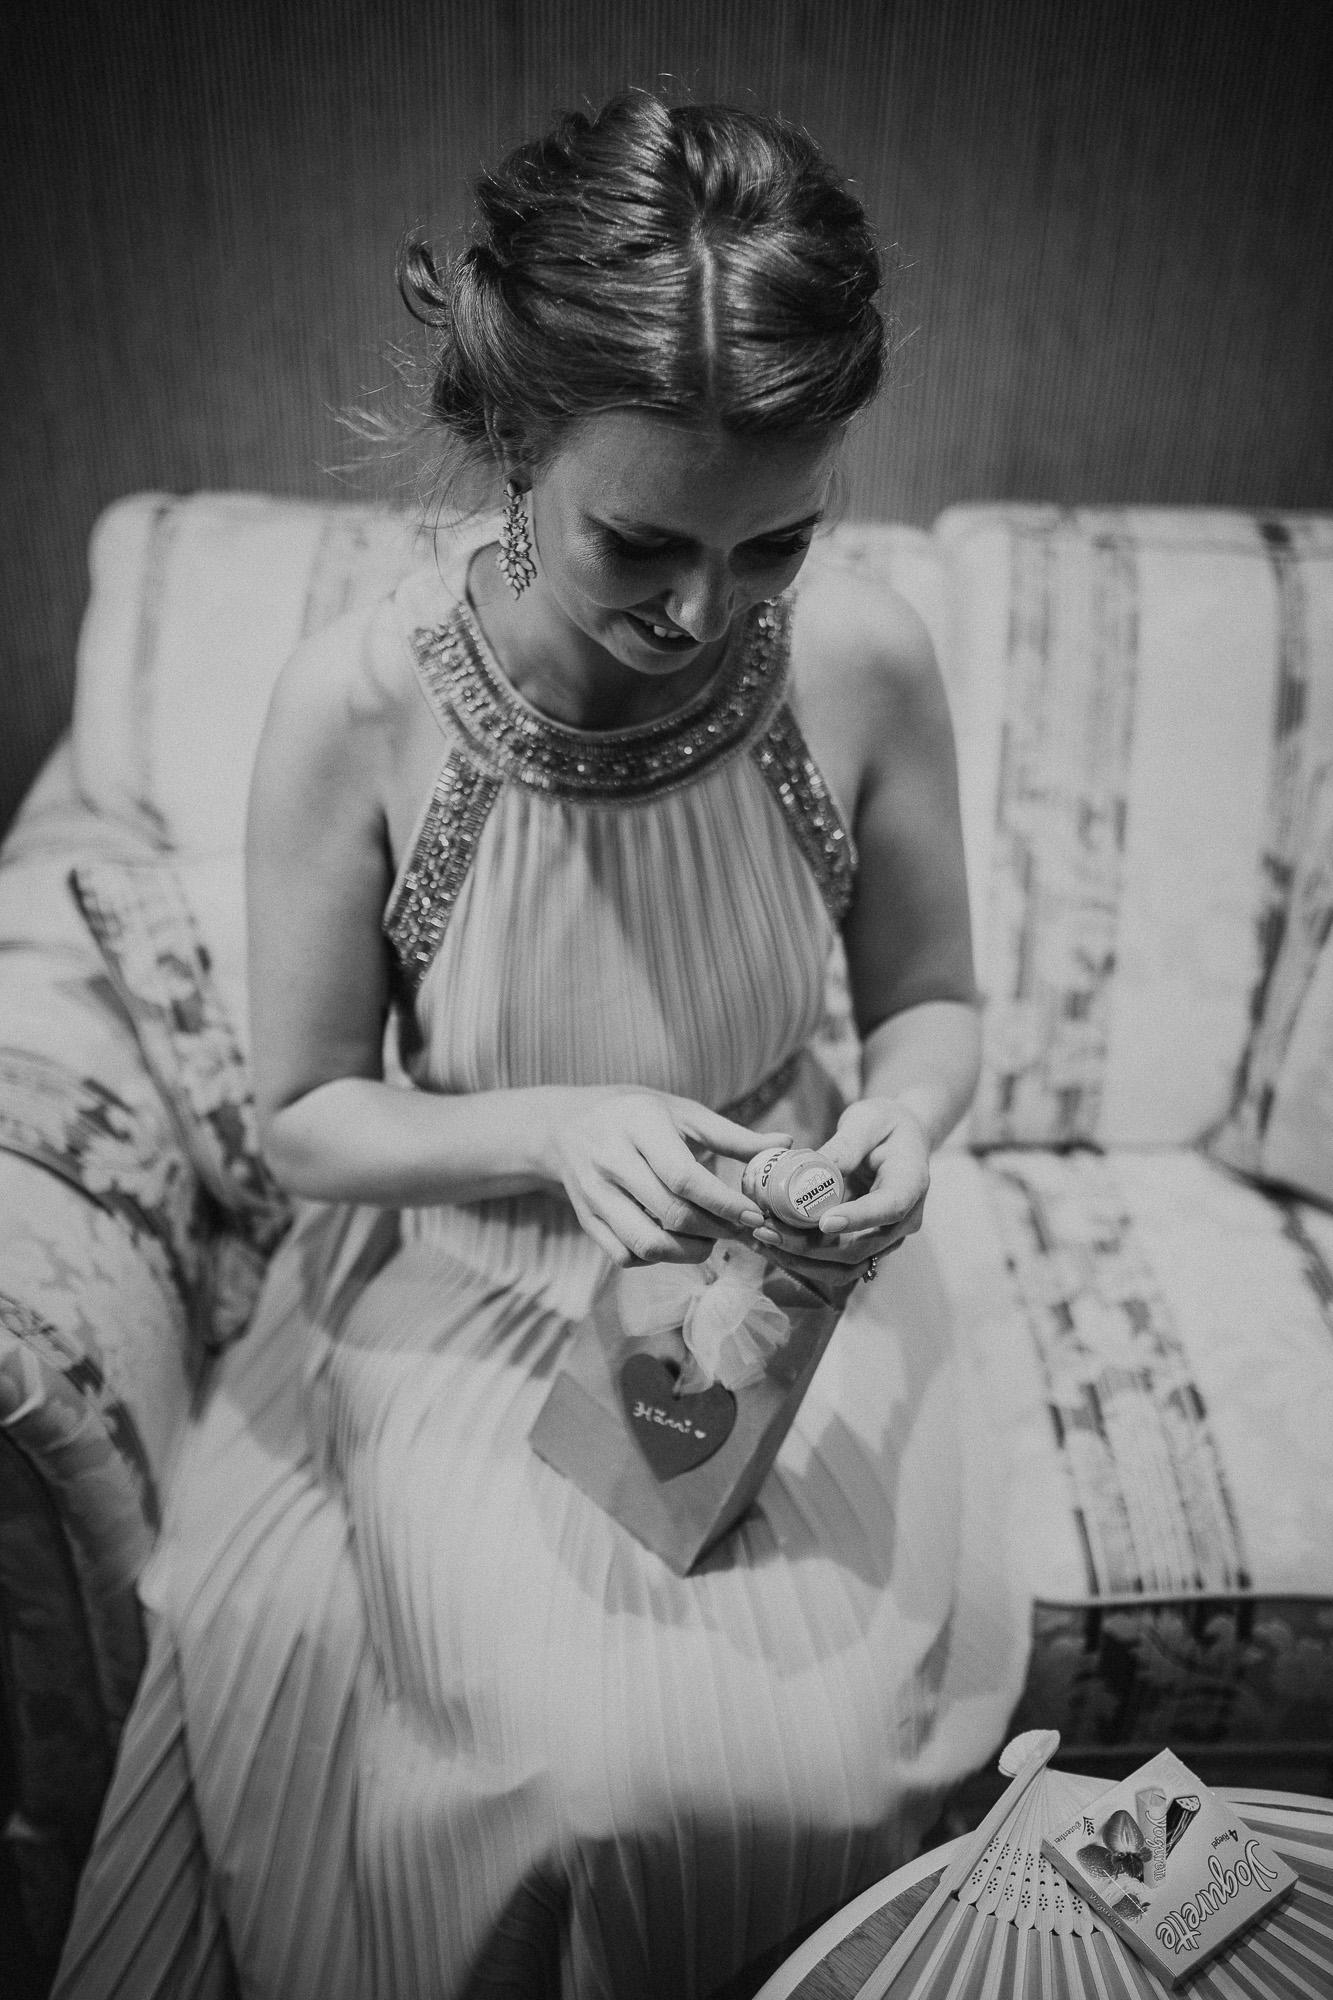 DanielaMarquardtPhotography_Hochzeitsfotograf_Düsseldorf_Köln_Mallorca_Bayern_Austria_Harz_Wedding_AileenundLennart_Weddingphotographer_Ibiza_Tuskany_Italien_Toskana_Portugal_Lissabon35